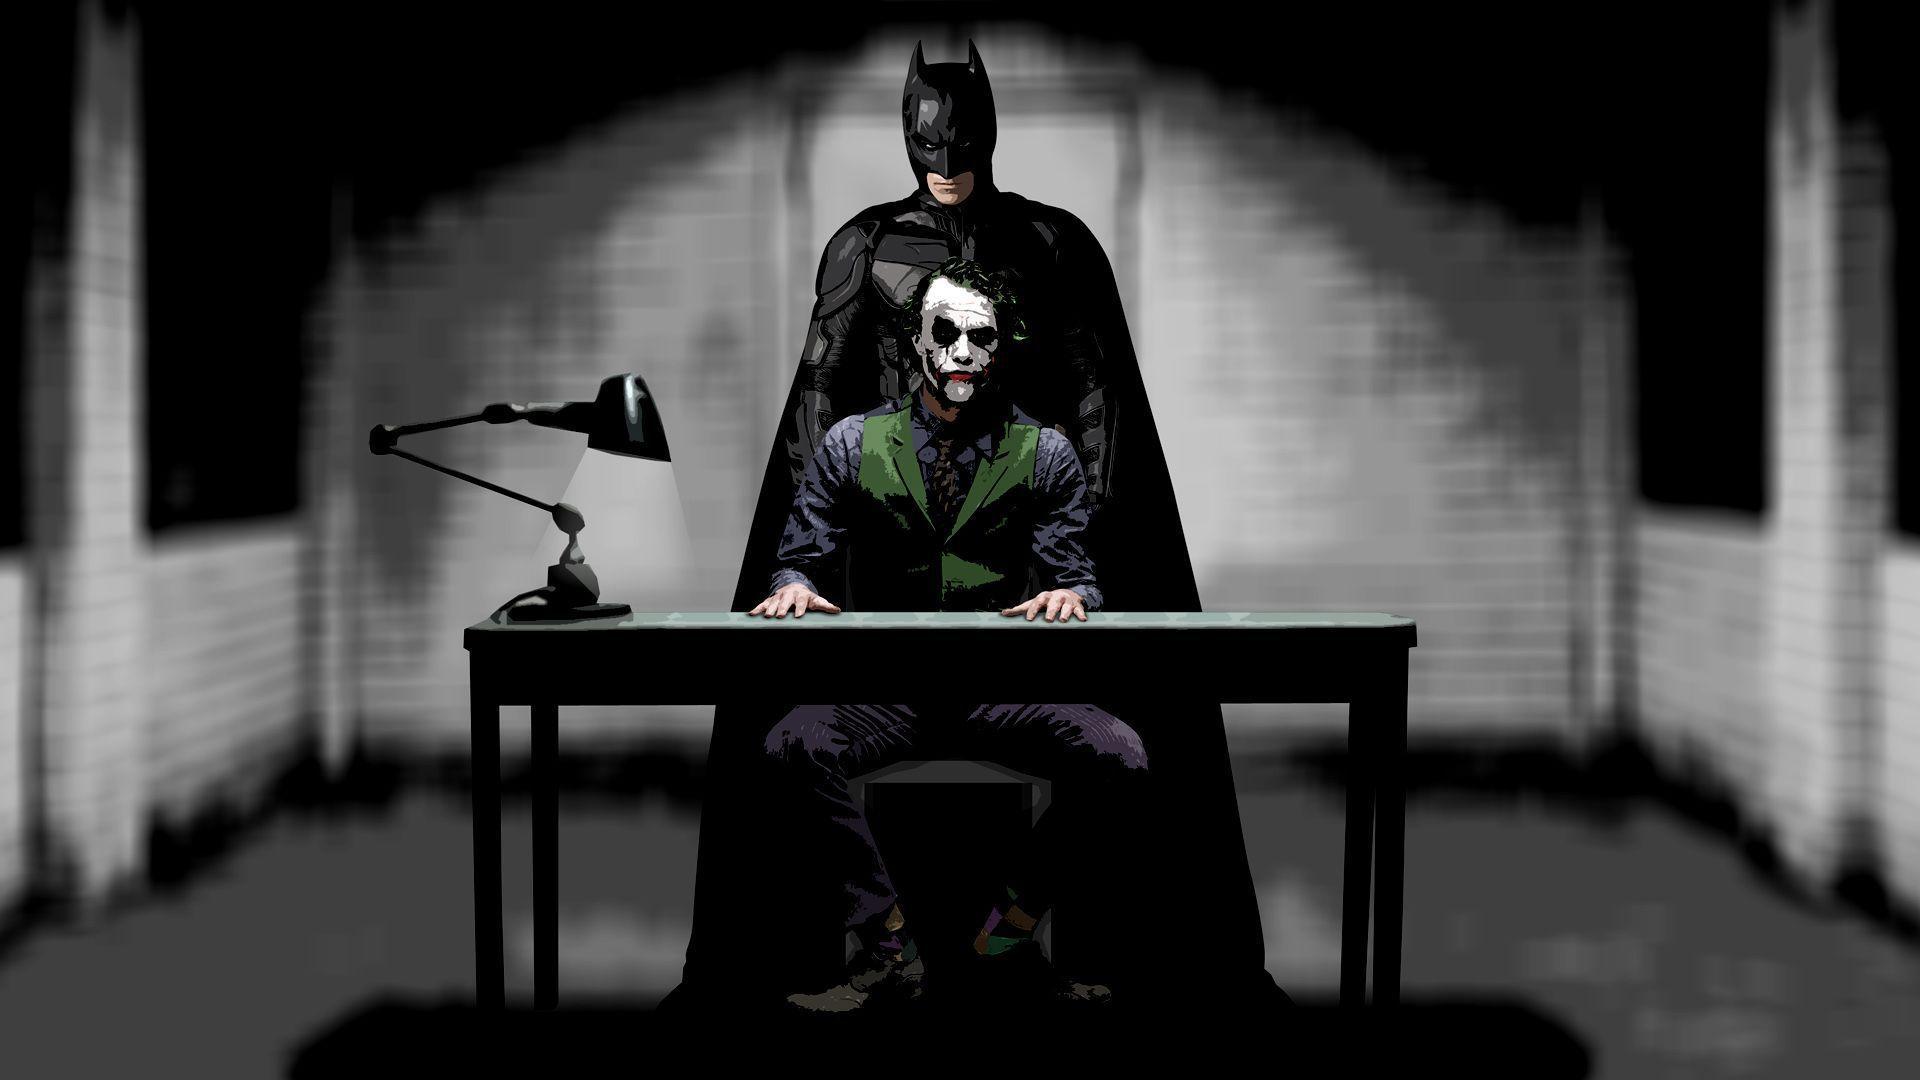 Batman Joker Full Hd Wallpapers Wallpaper Cave